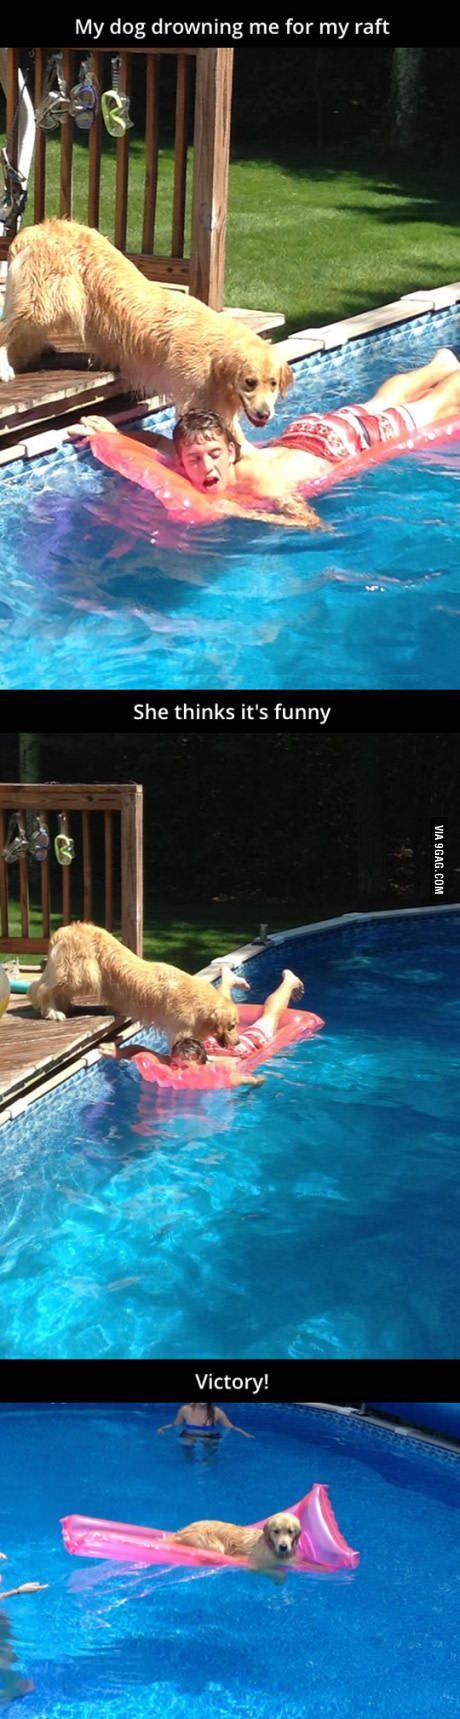 Dog drowning human for the raft